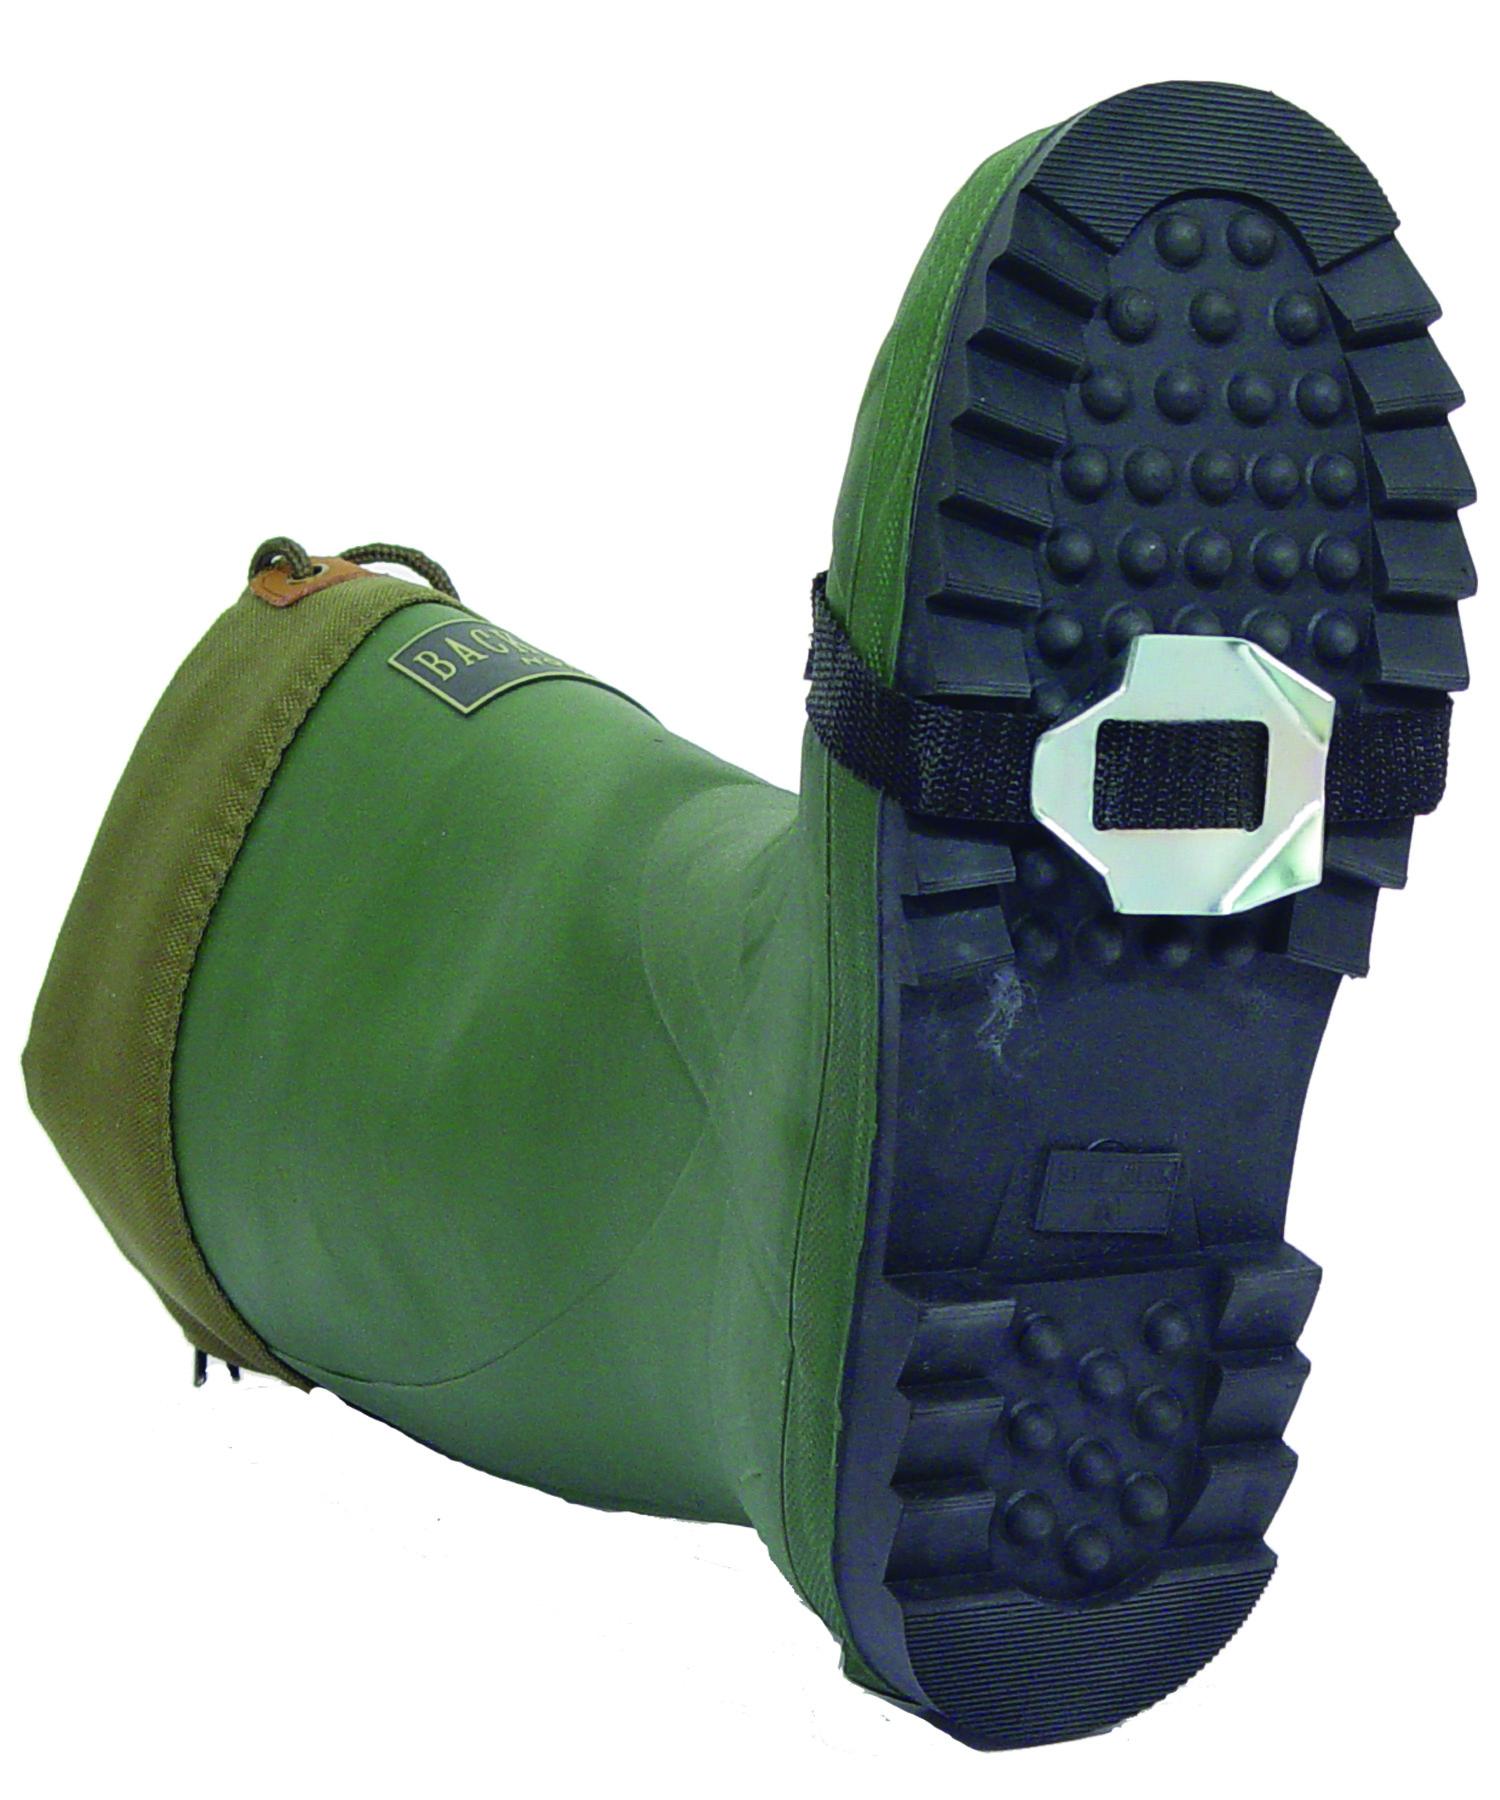 Compac 鞋底防滑钉